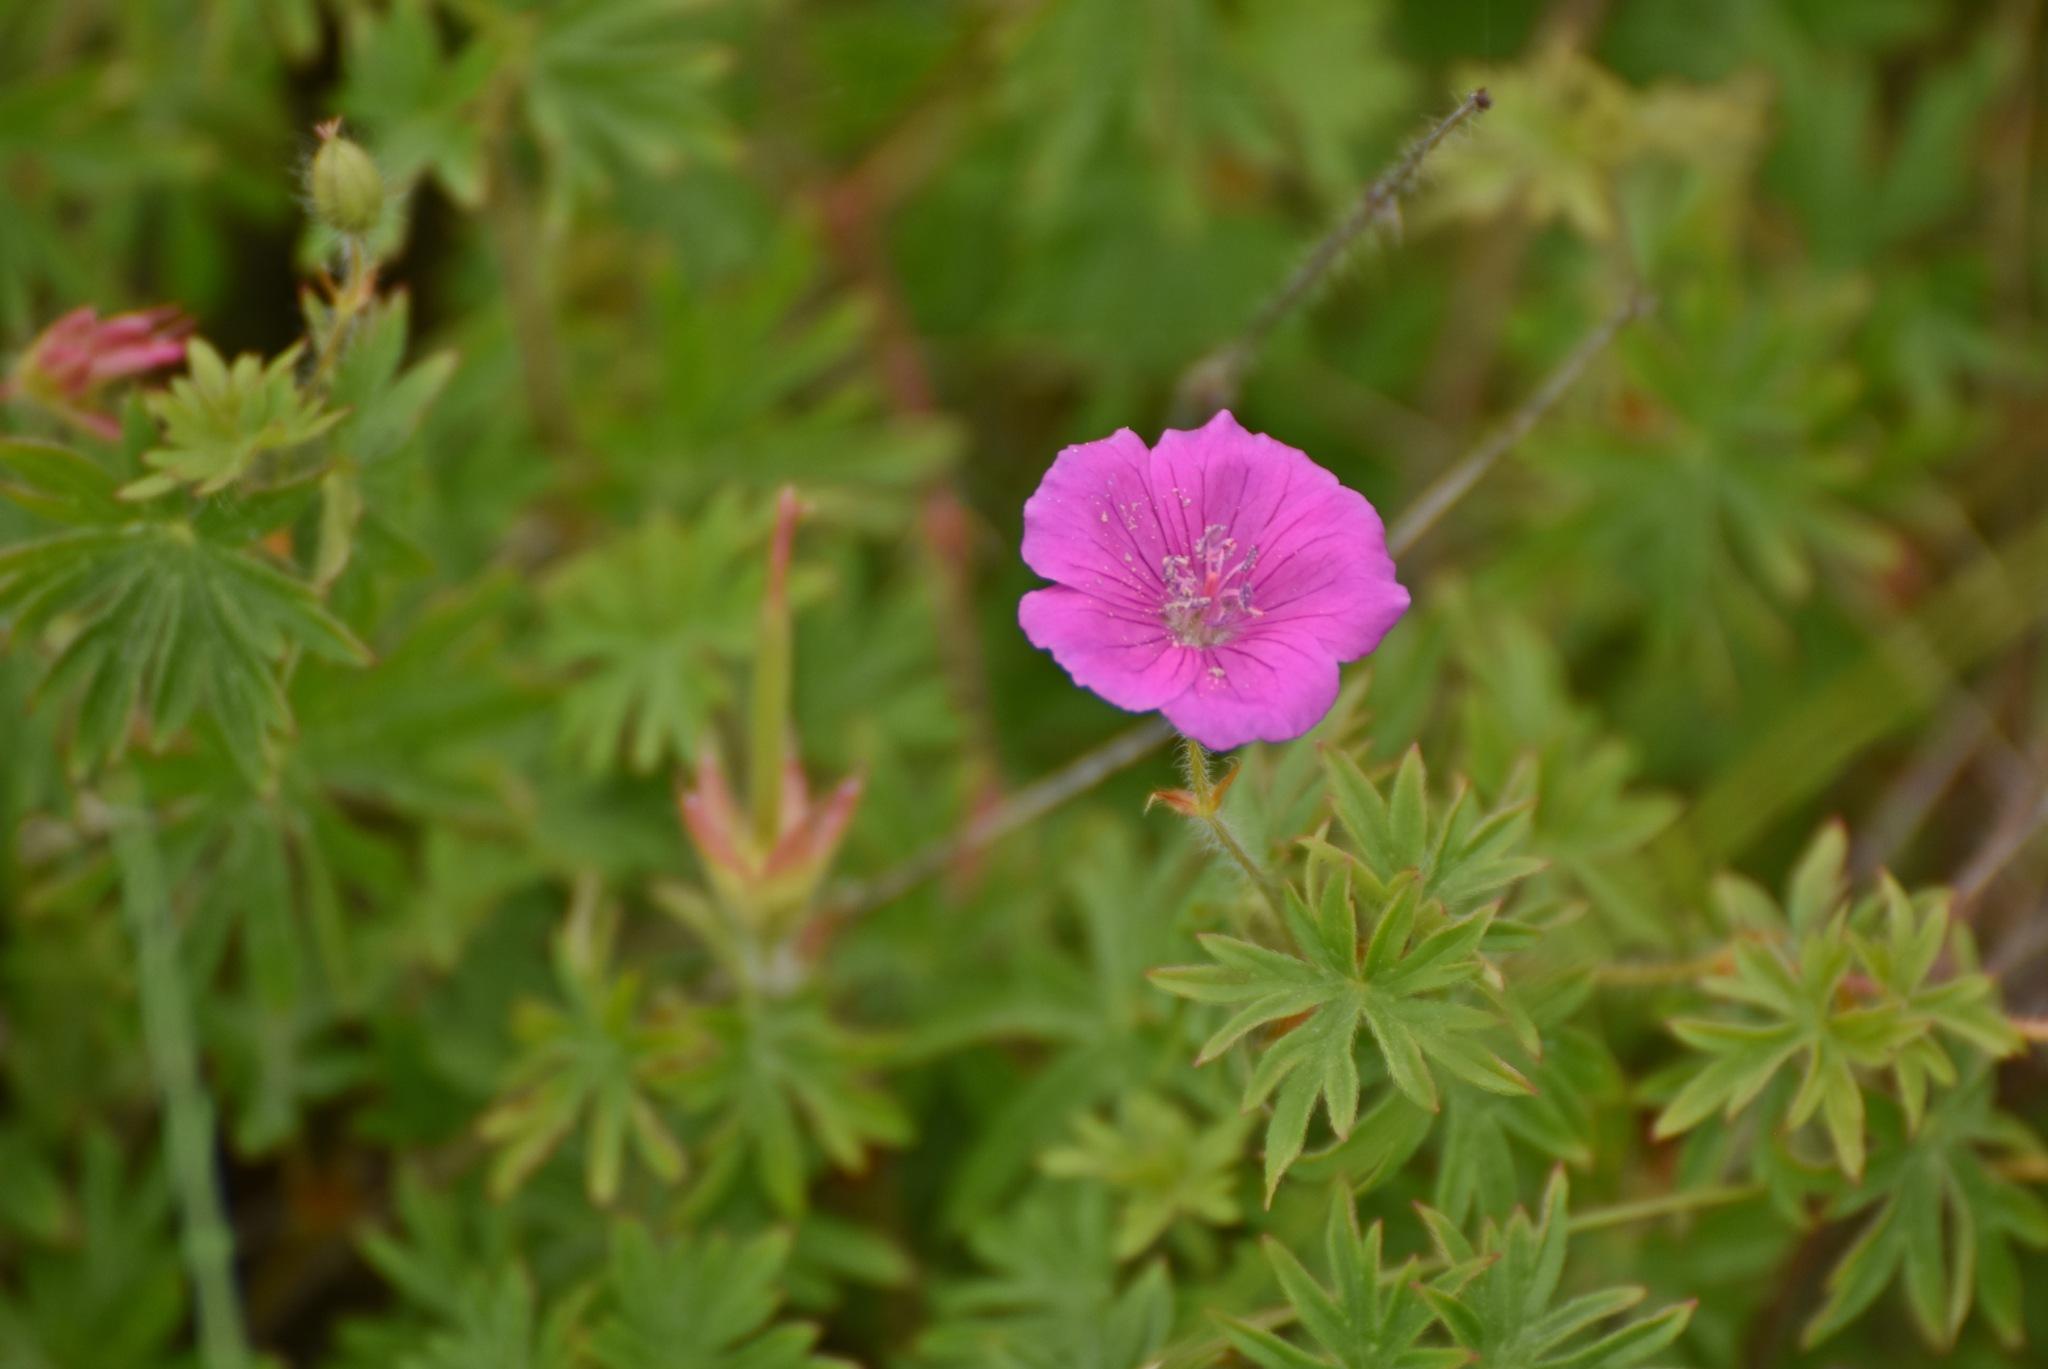 Summer flower by monica.westerholm.5